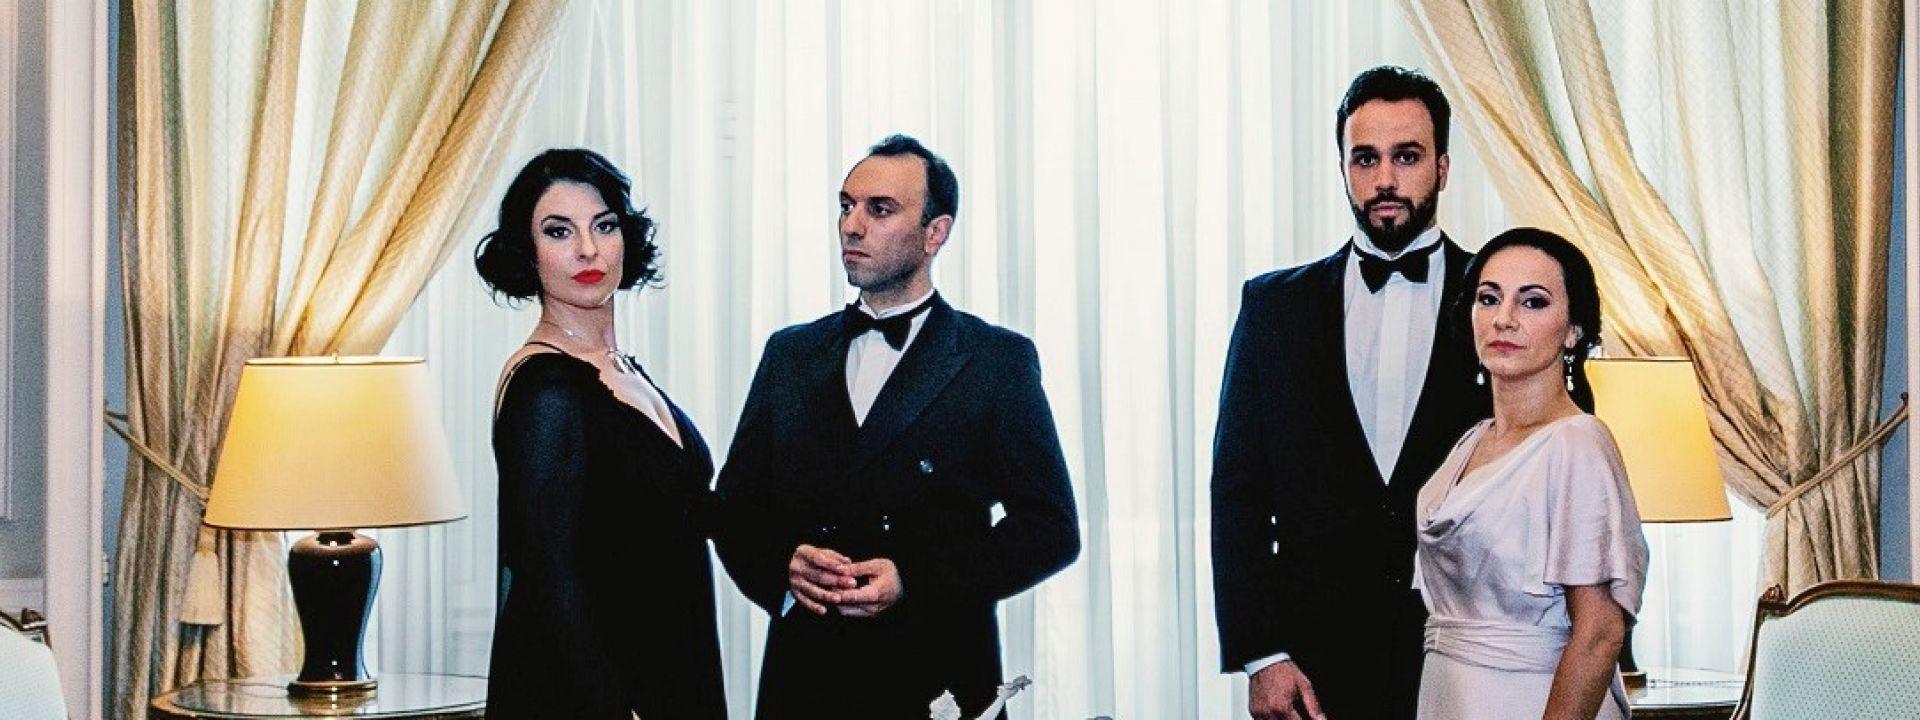 Music Theatre Days 2019: Spyridon-Filiskos Samaras - The princess of Sazan - Εικόνα